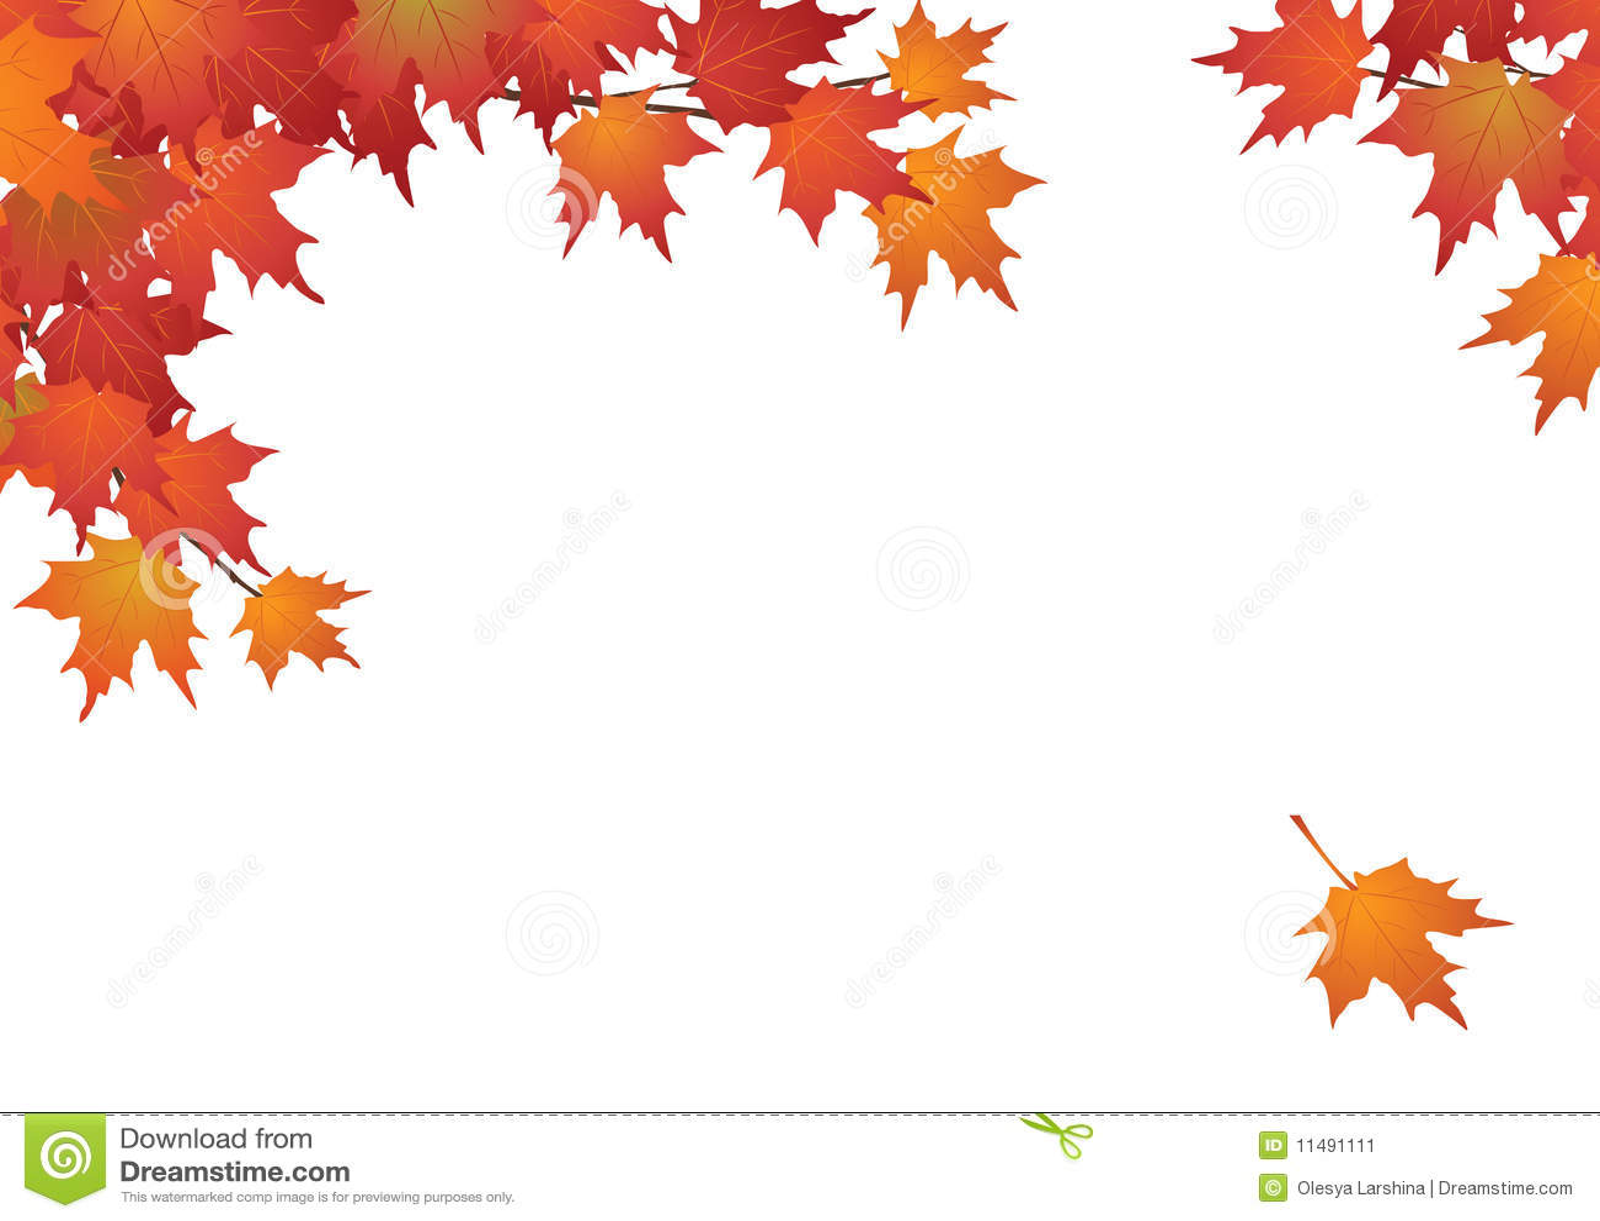 Falling Leaves Wallpaper Free Download Autumn Leaves Background Frame Stock Vector Illustration